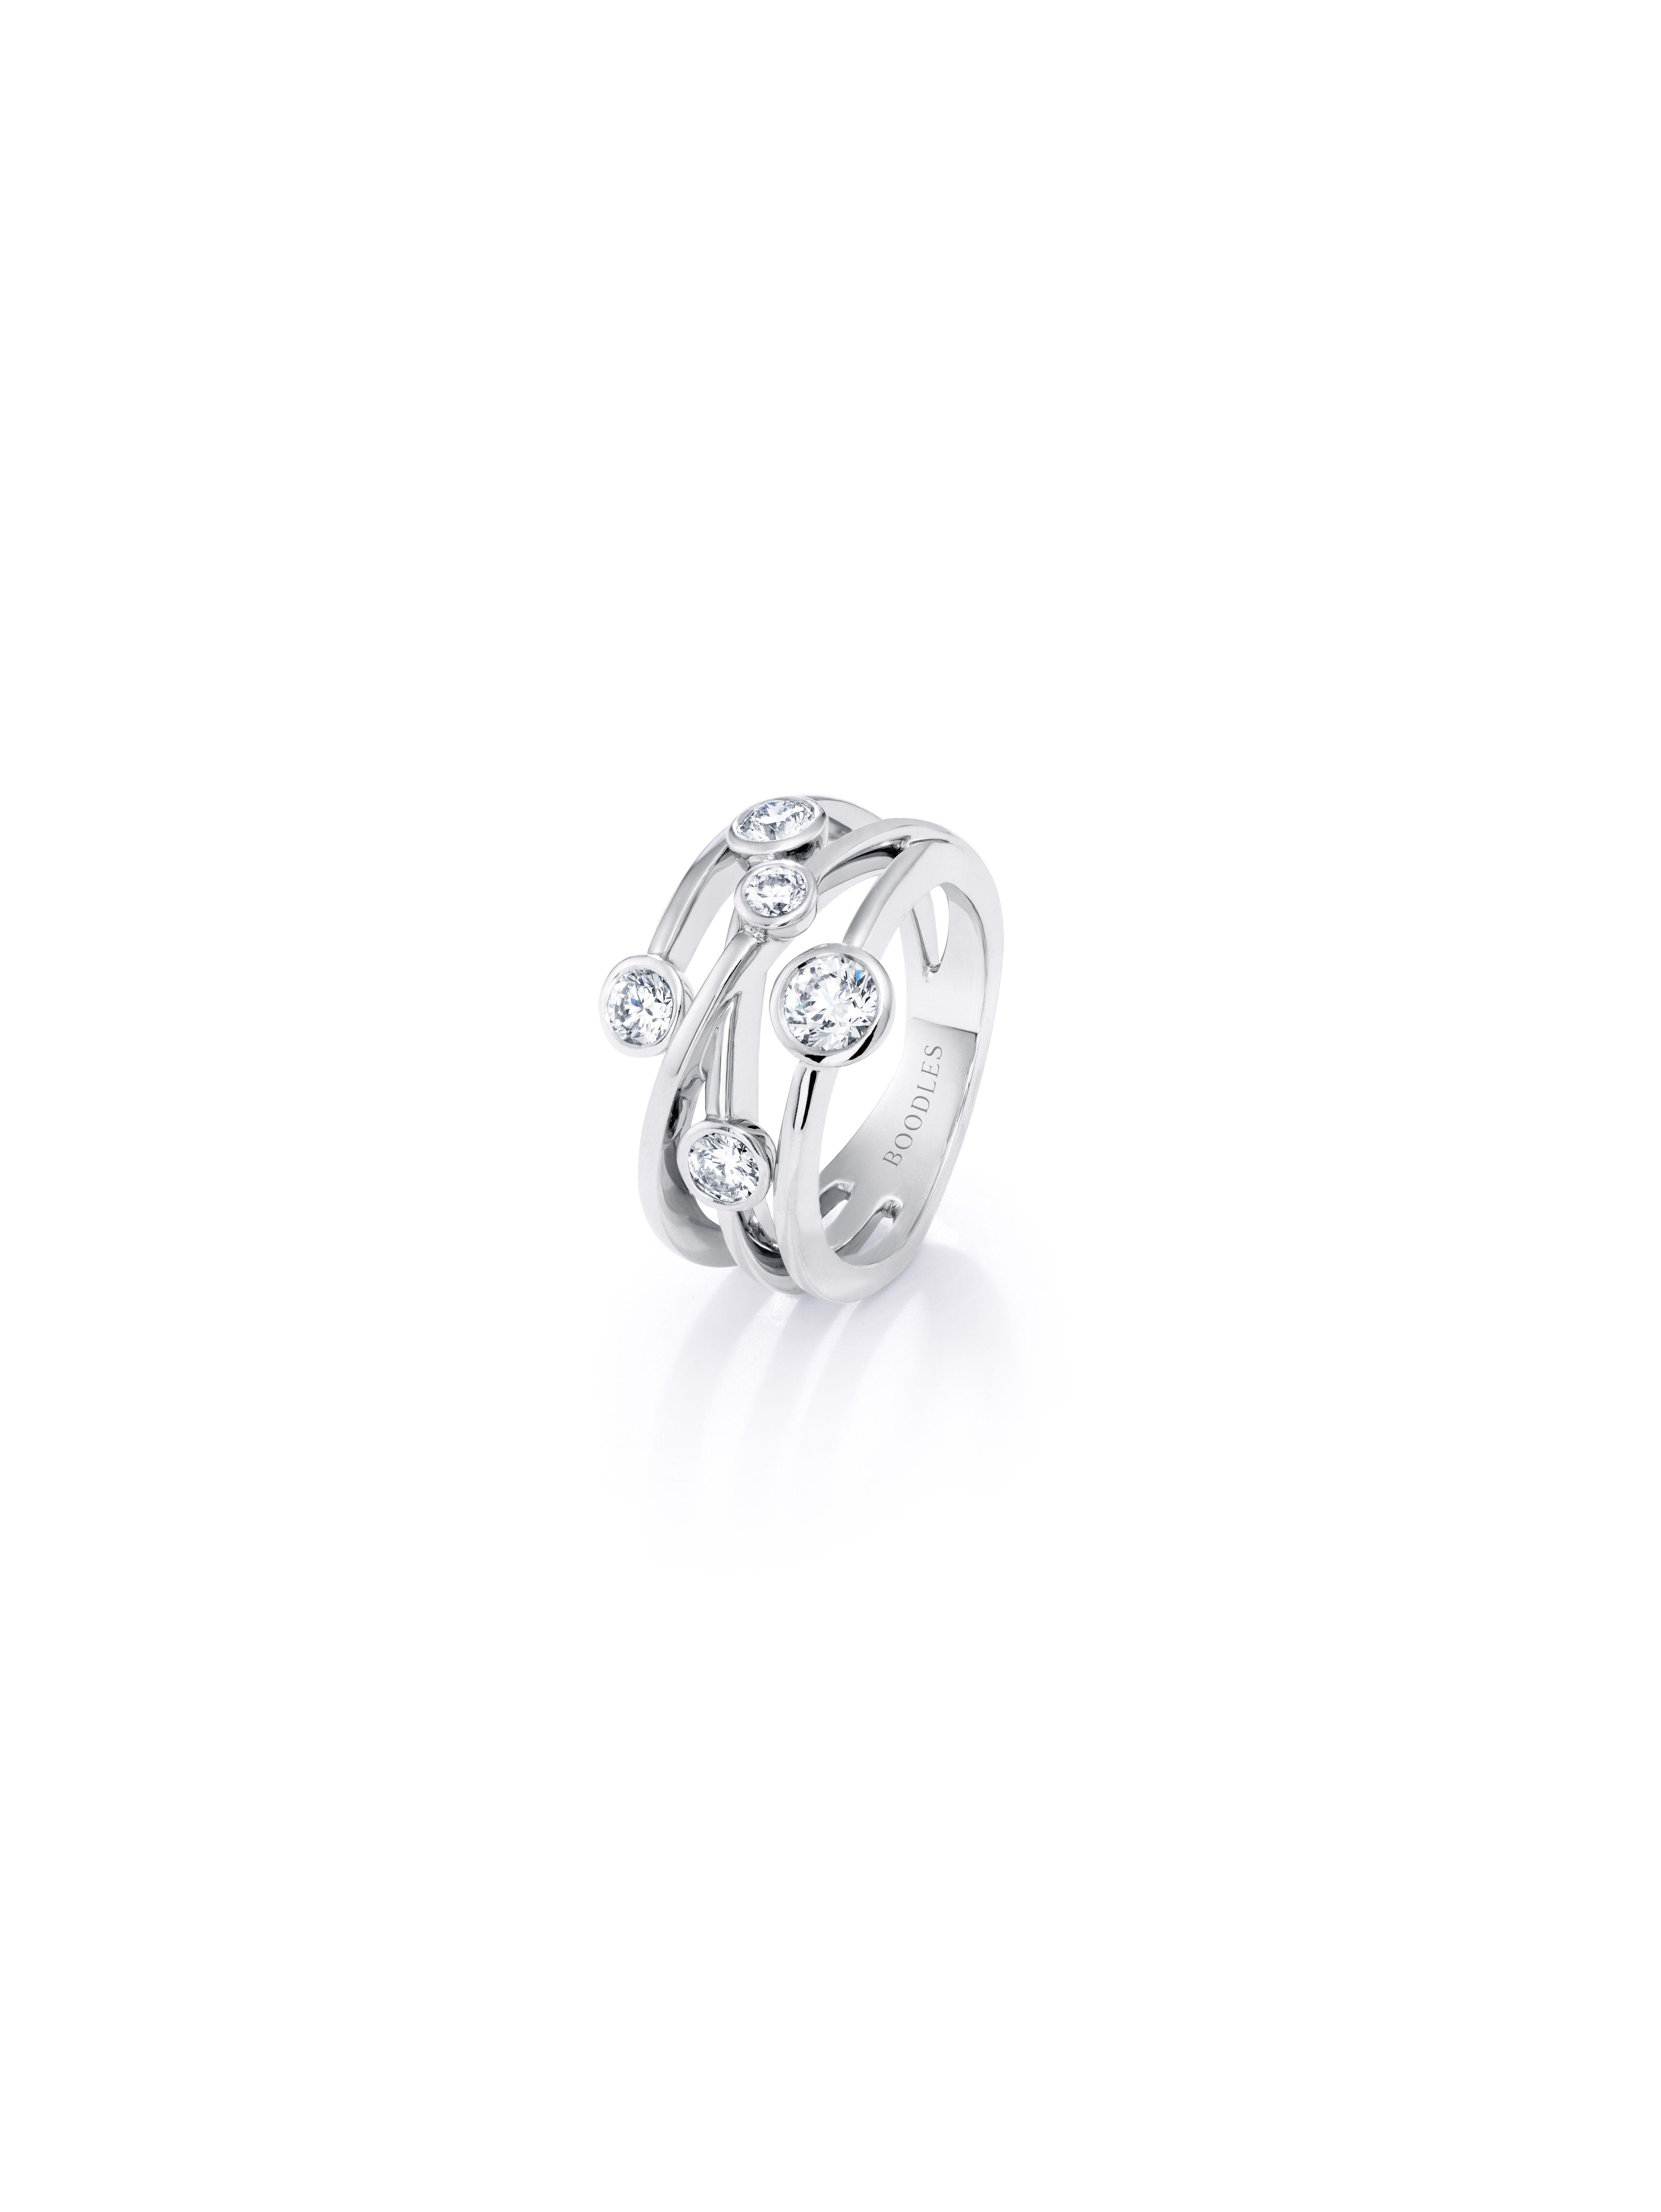 6af7a86dfbb304 Boodles 'Raindance Anniversary' ring featuring five diamonds set in  platinum.